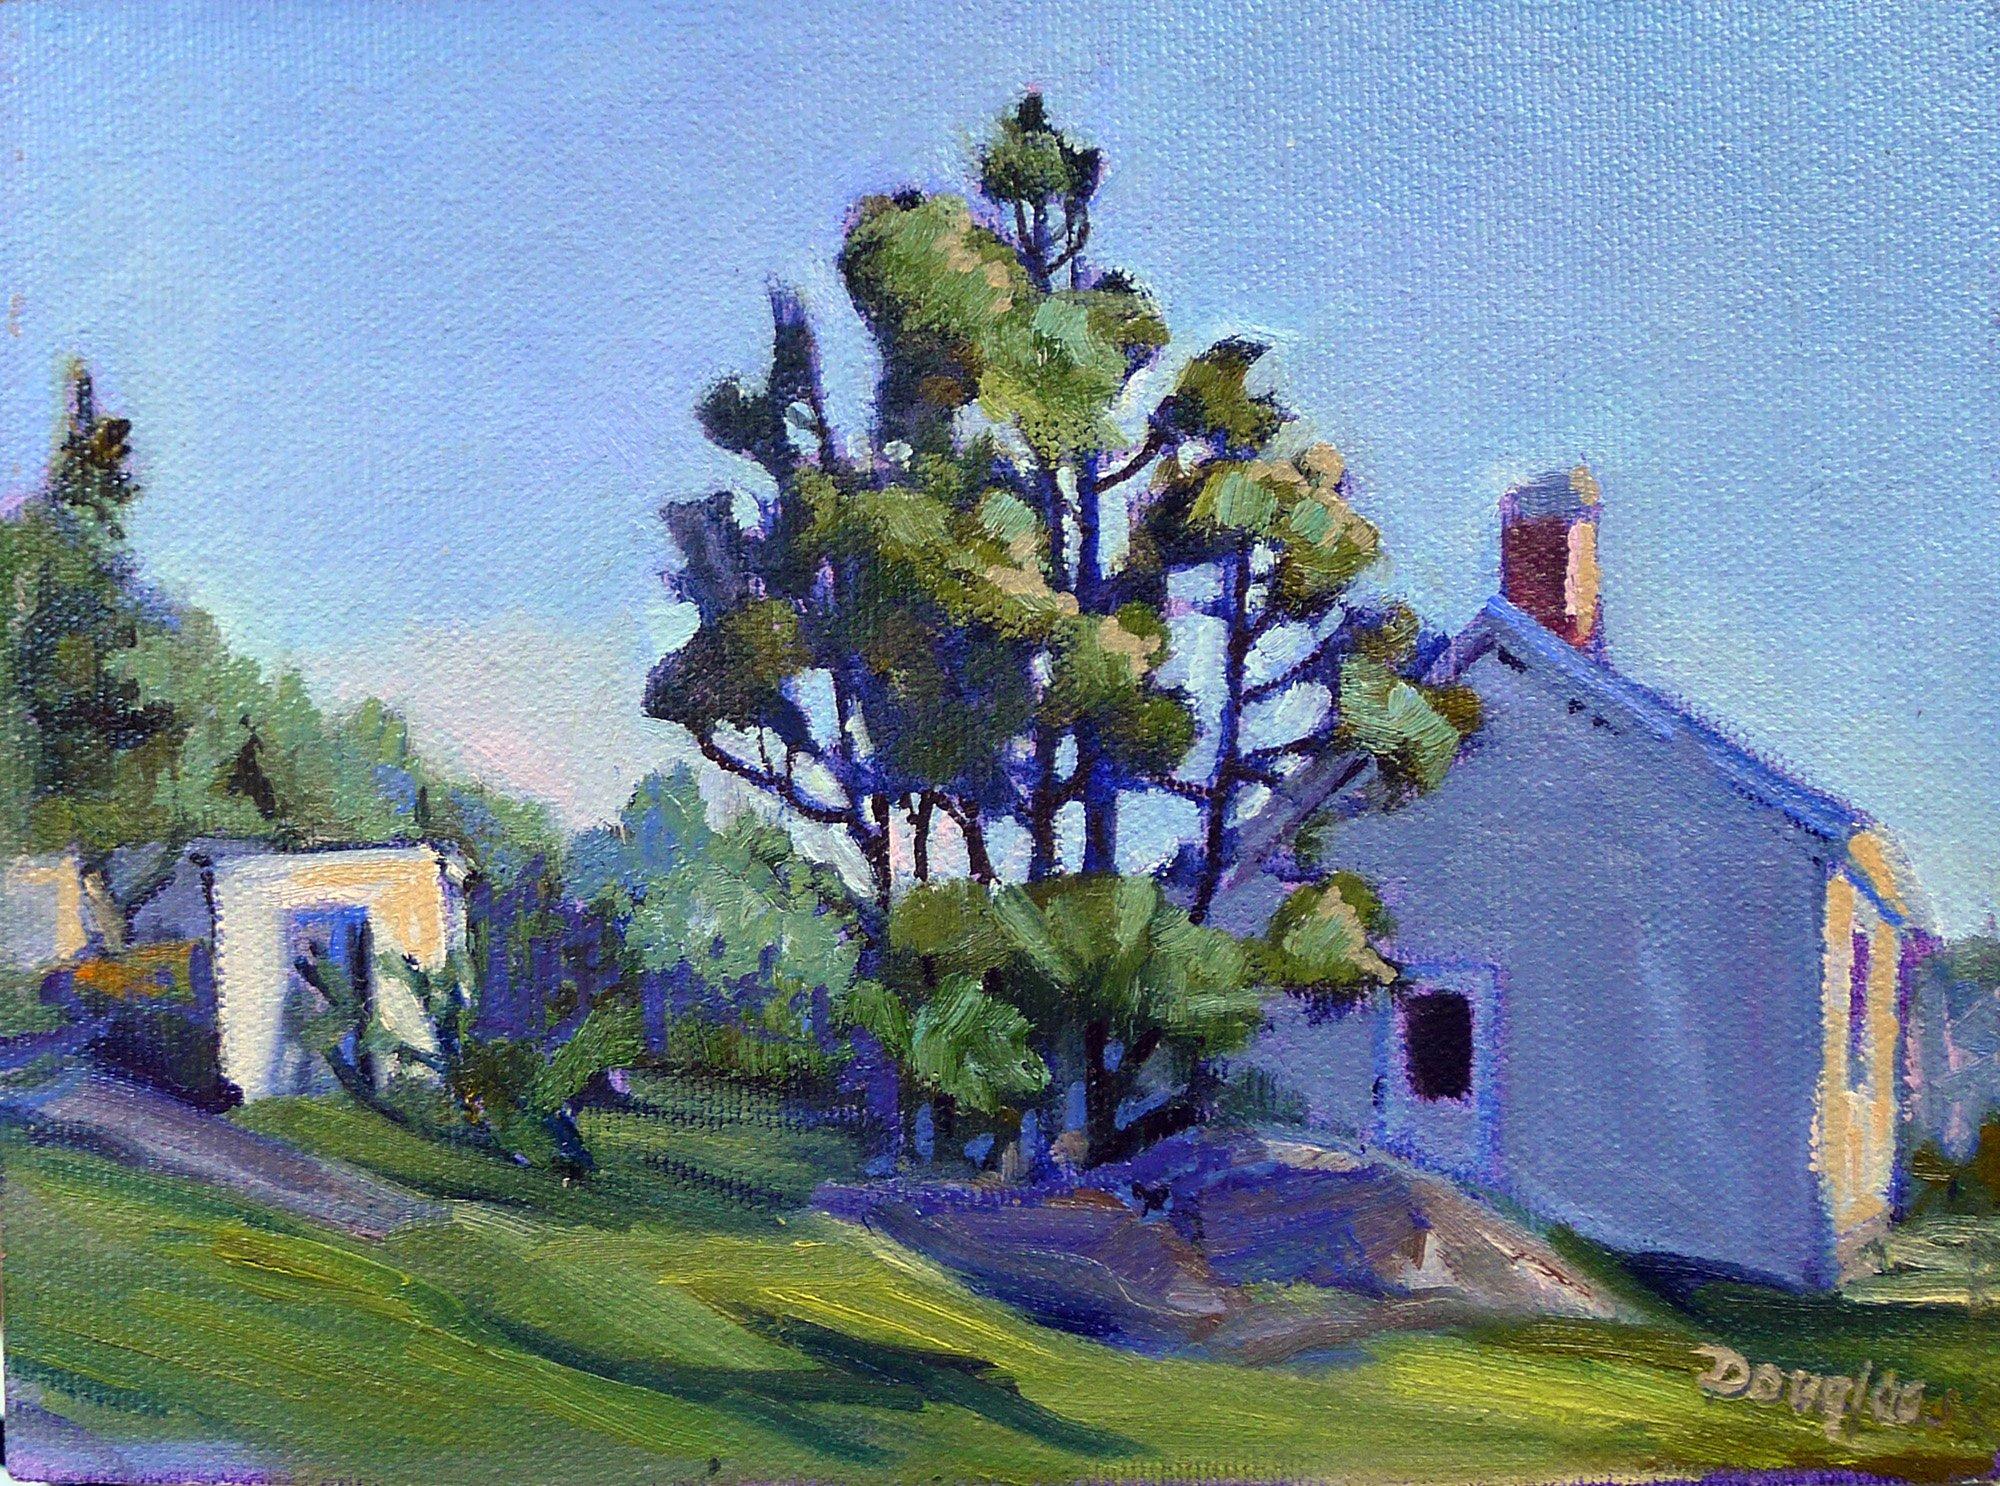 Schoolhouse, Monhegan, oil on canvas